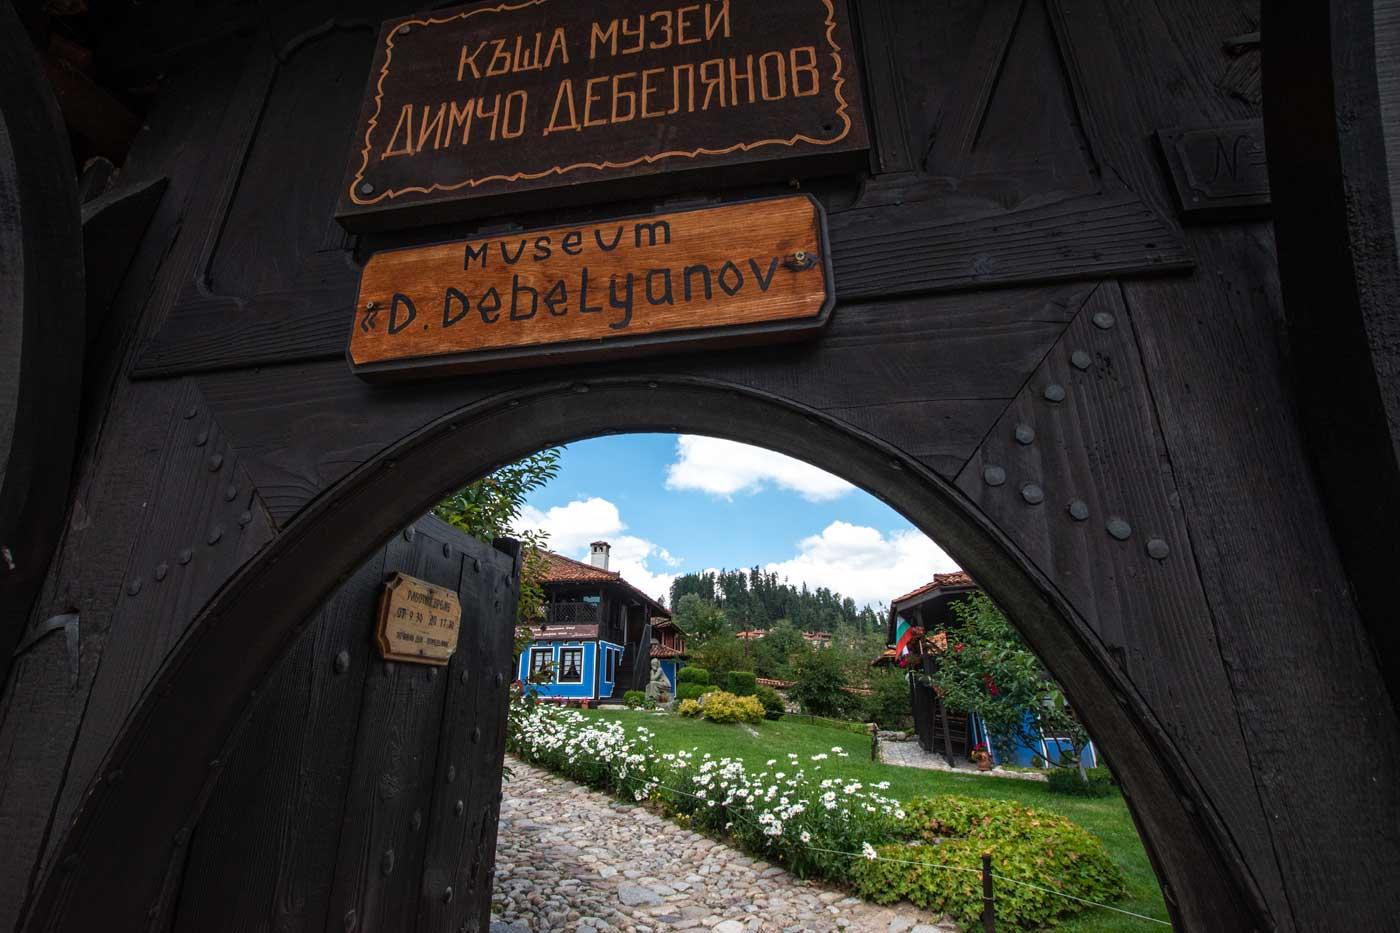 what to see in koprivshtitsa - debelyanov house